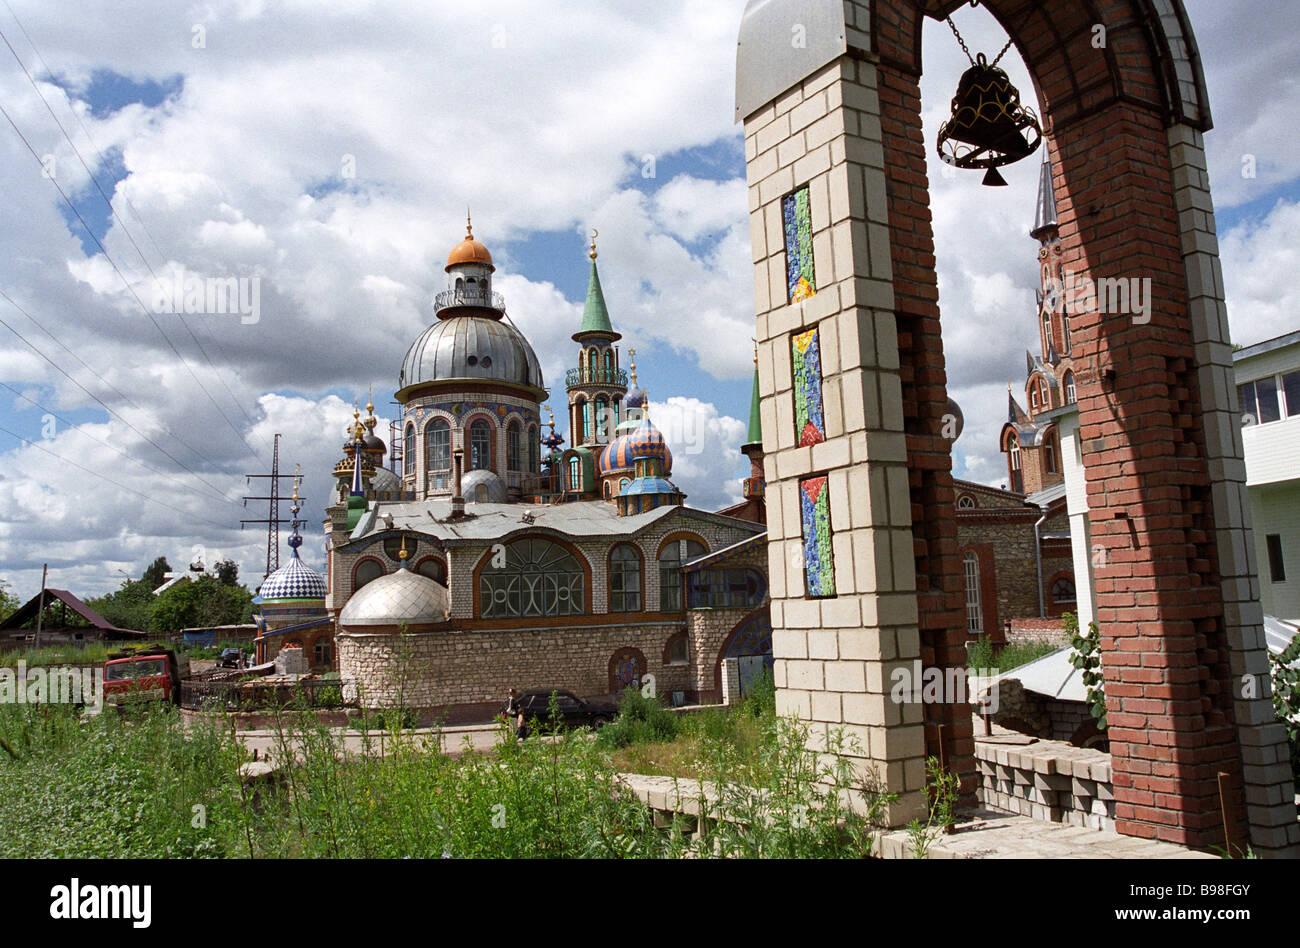 Alle Religionen-Kirche in Staroe Arakchino Dorf in der Nähe von Kazan Stockbild